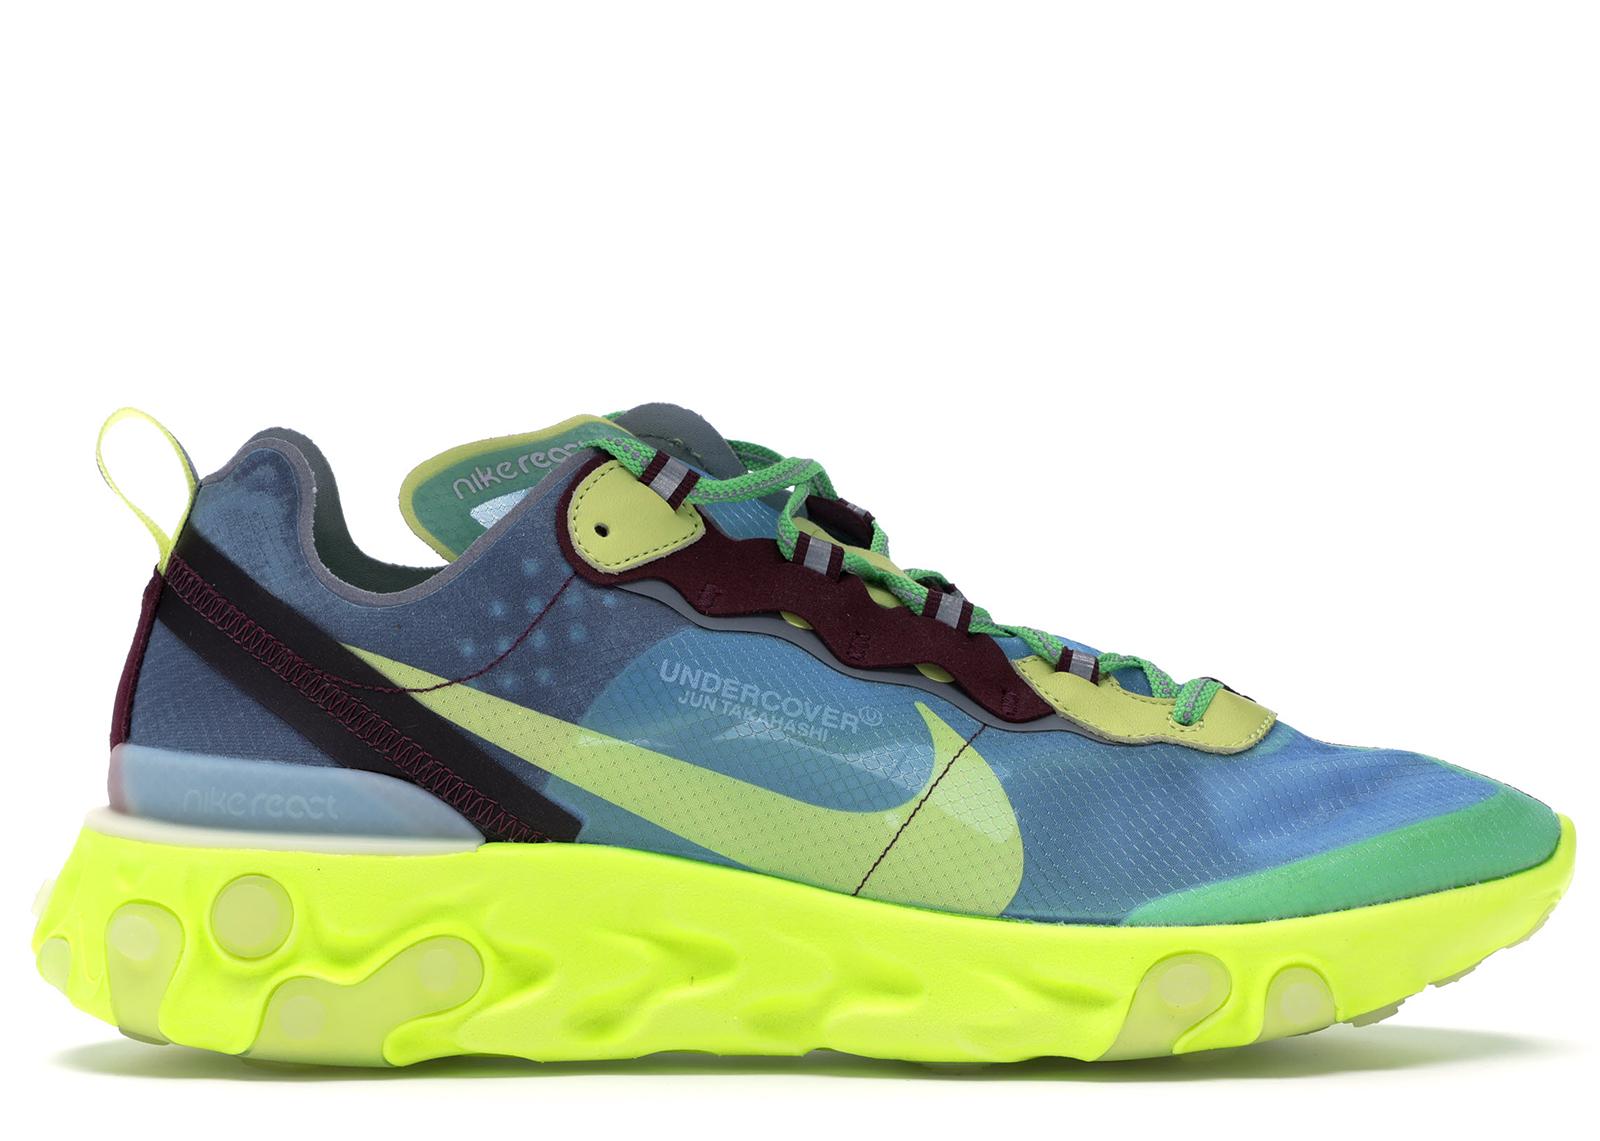 Nike React Element 87 Undercover Lakeside - BQ2718-400